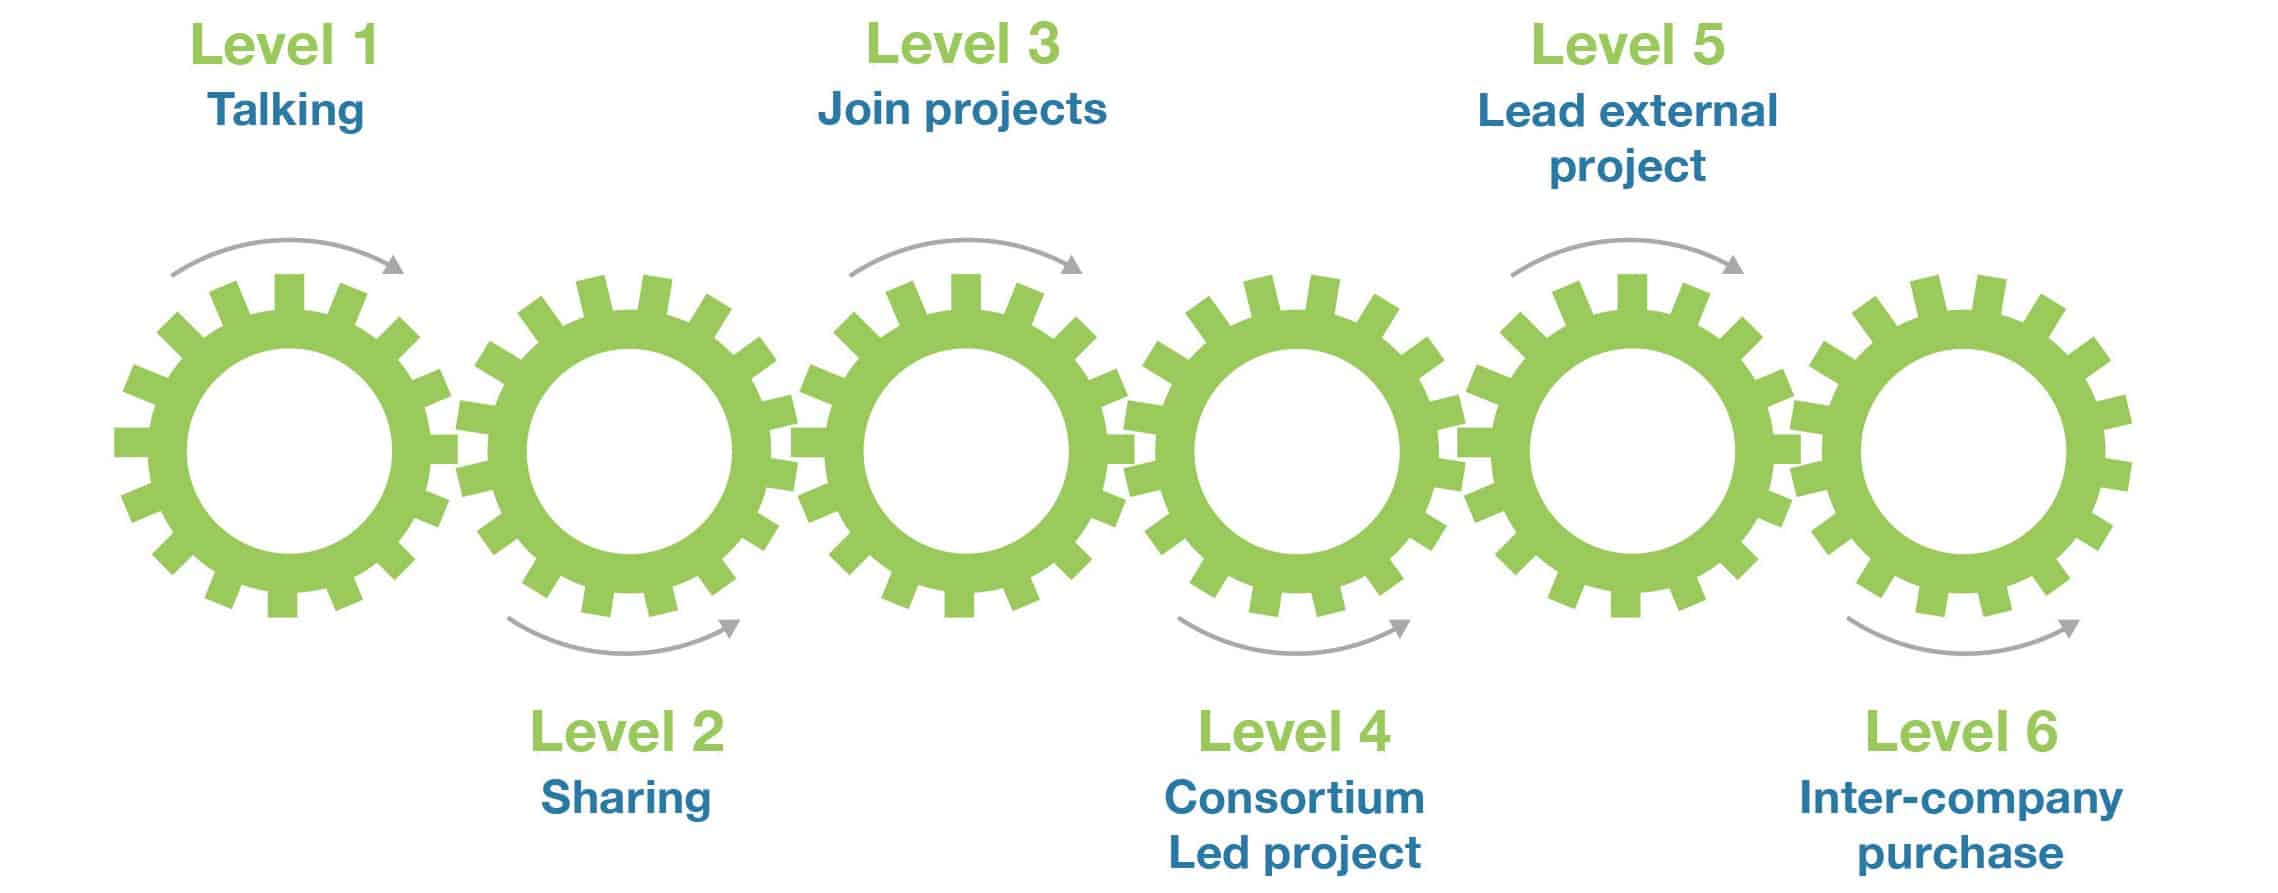 collaboration readiness level